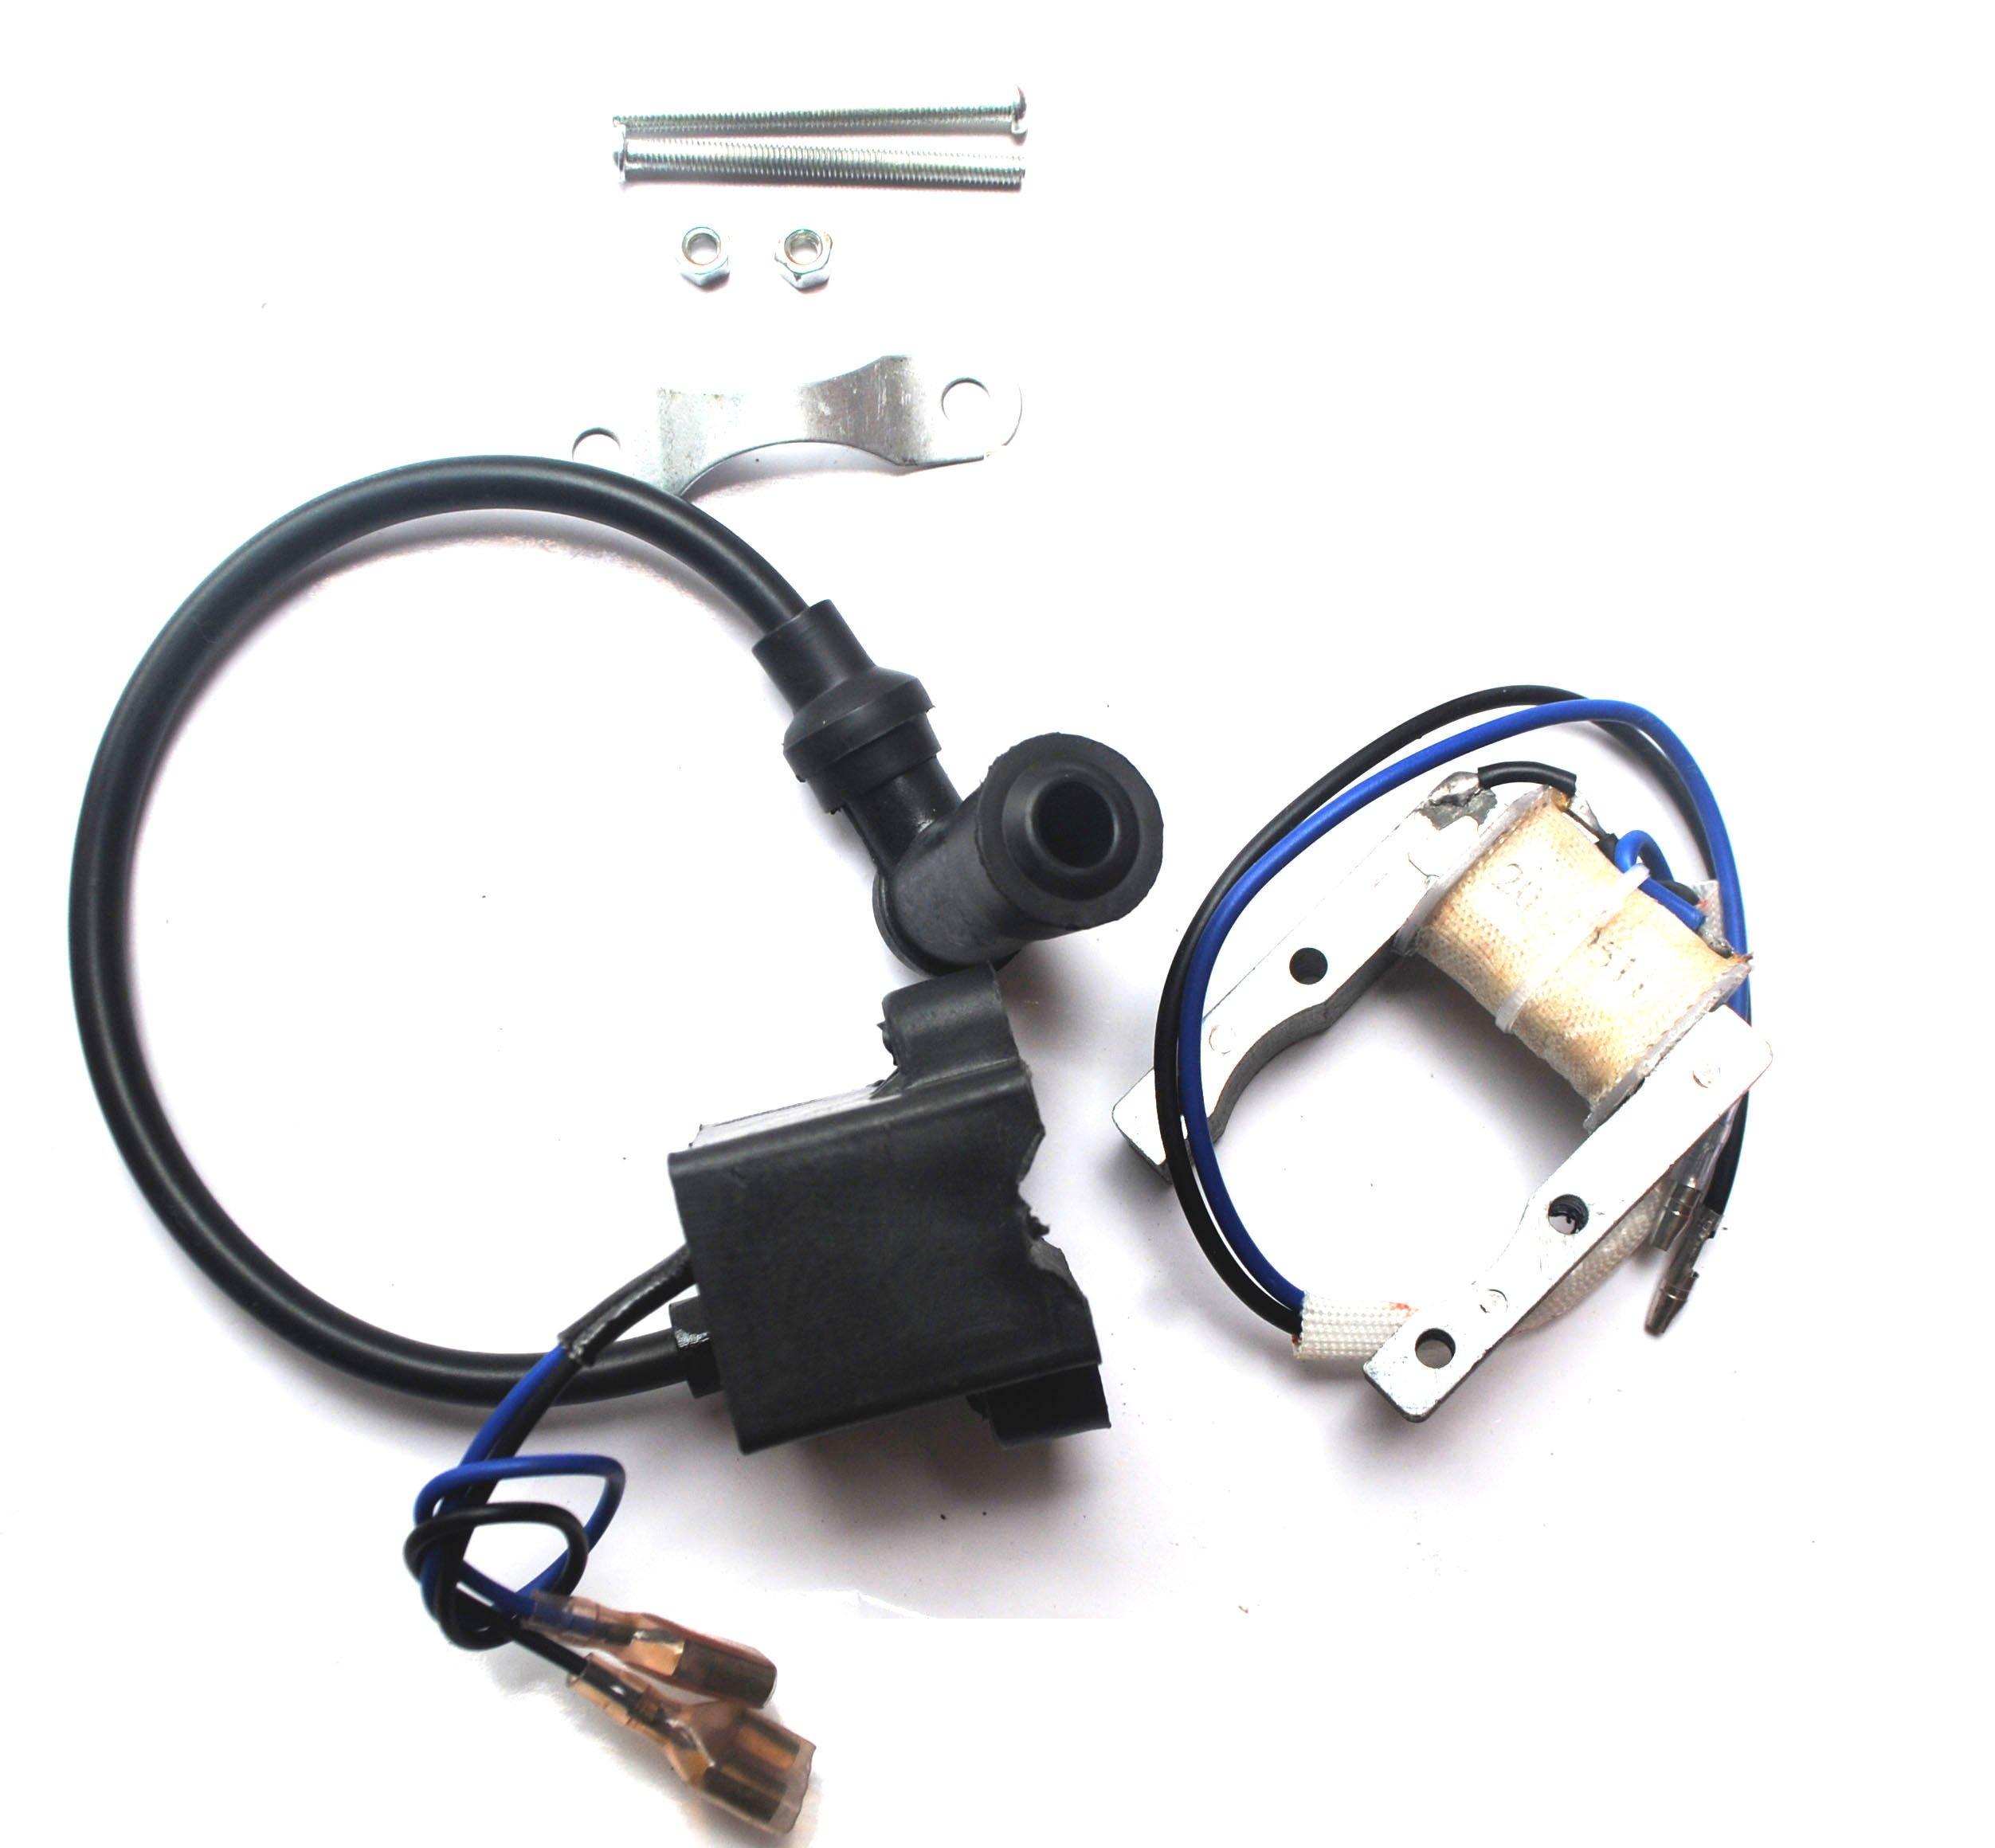 Bicycle Magneto Ignition Coil Spark Plug Motorized 49cc 50cc 66cc 80cc Engine